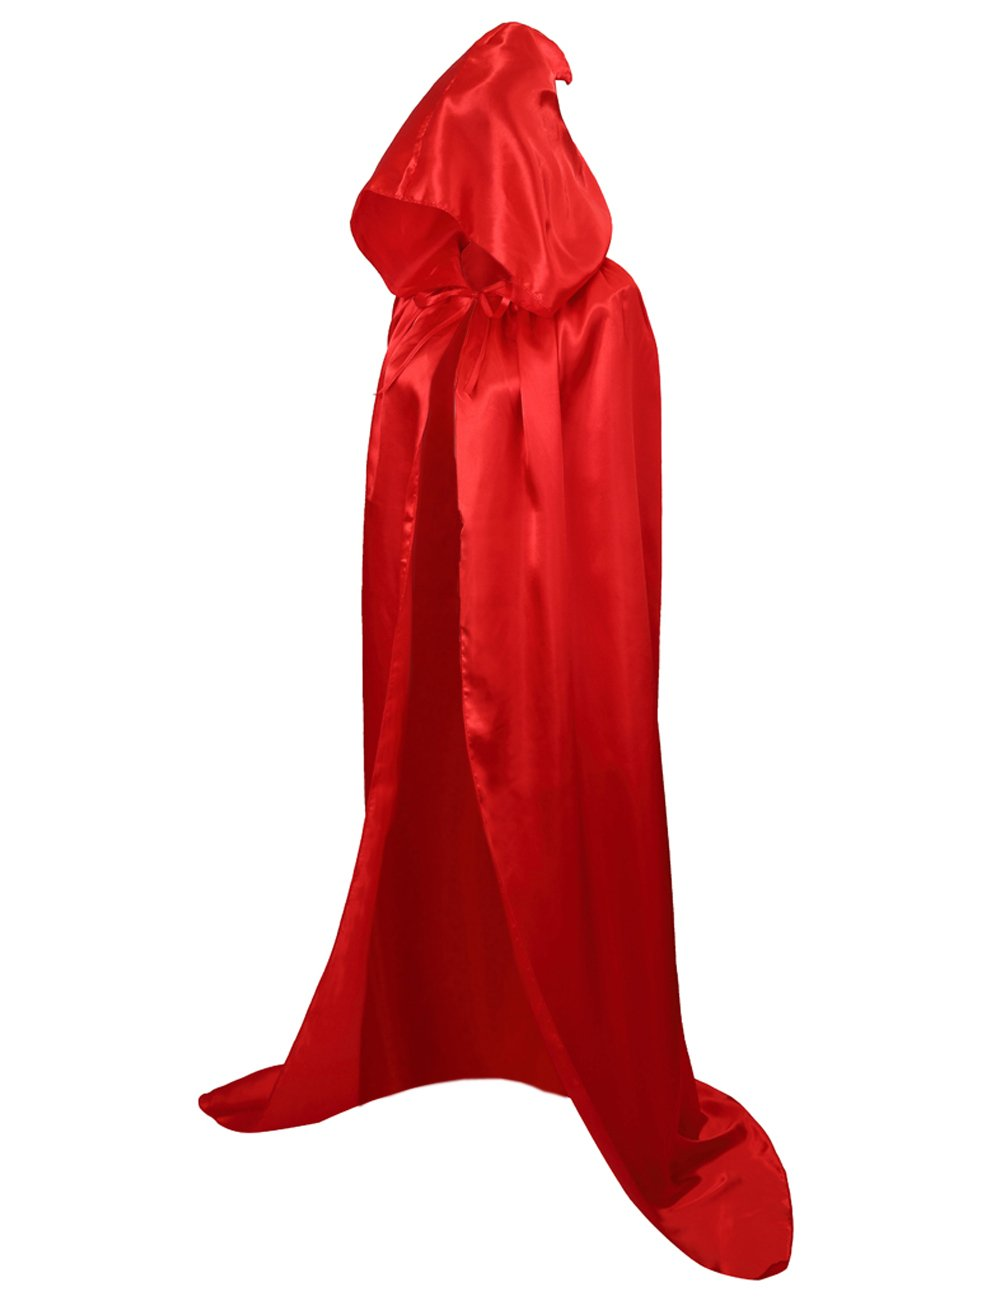 Colorful House Unisex Full Length Hooded Cape Christmas Costume Cloak